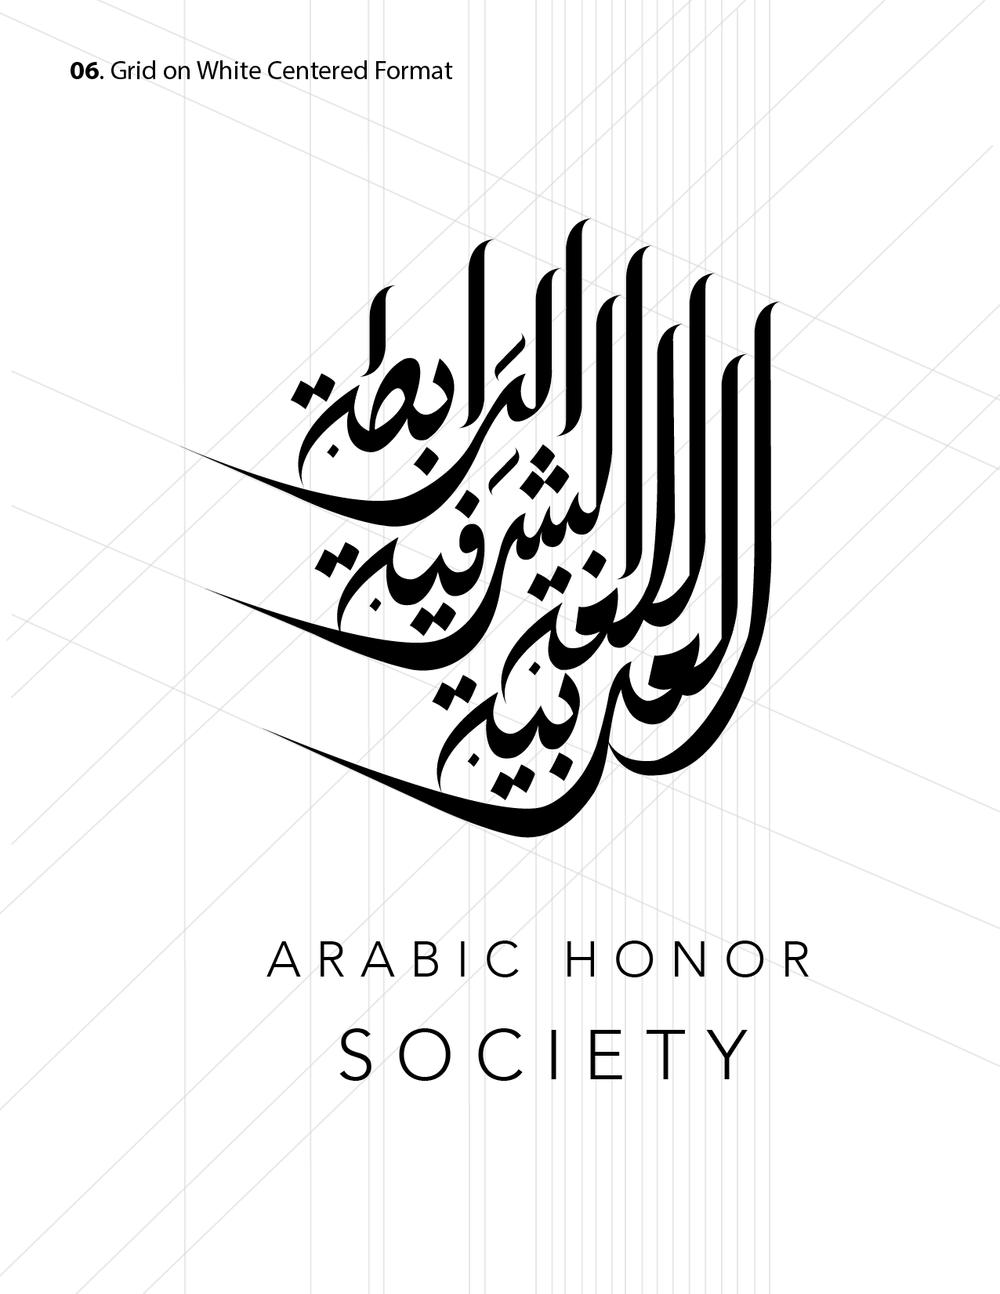 Logo-AHS-06.png